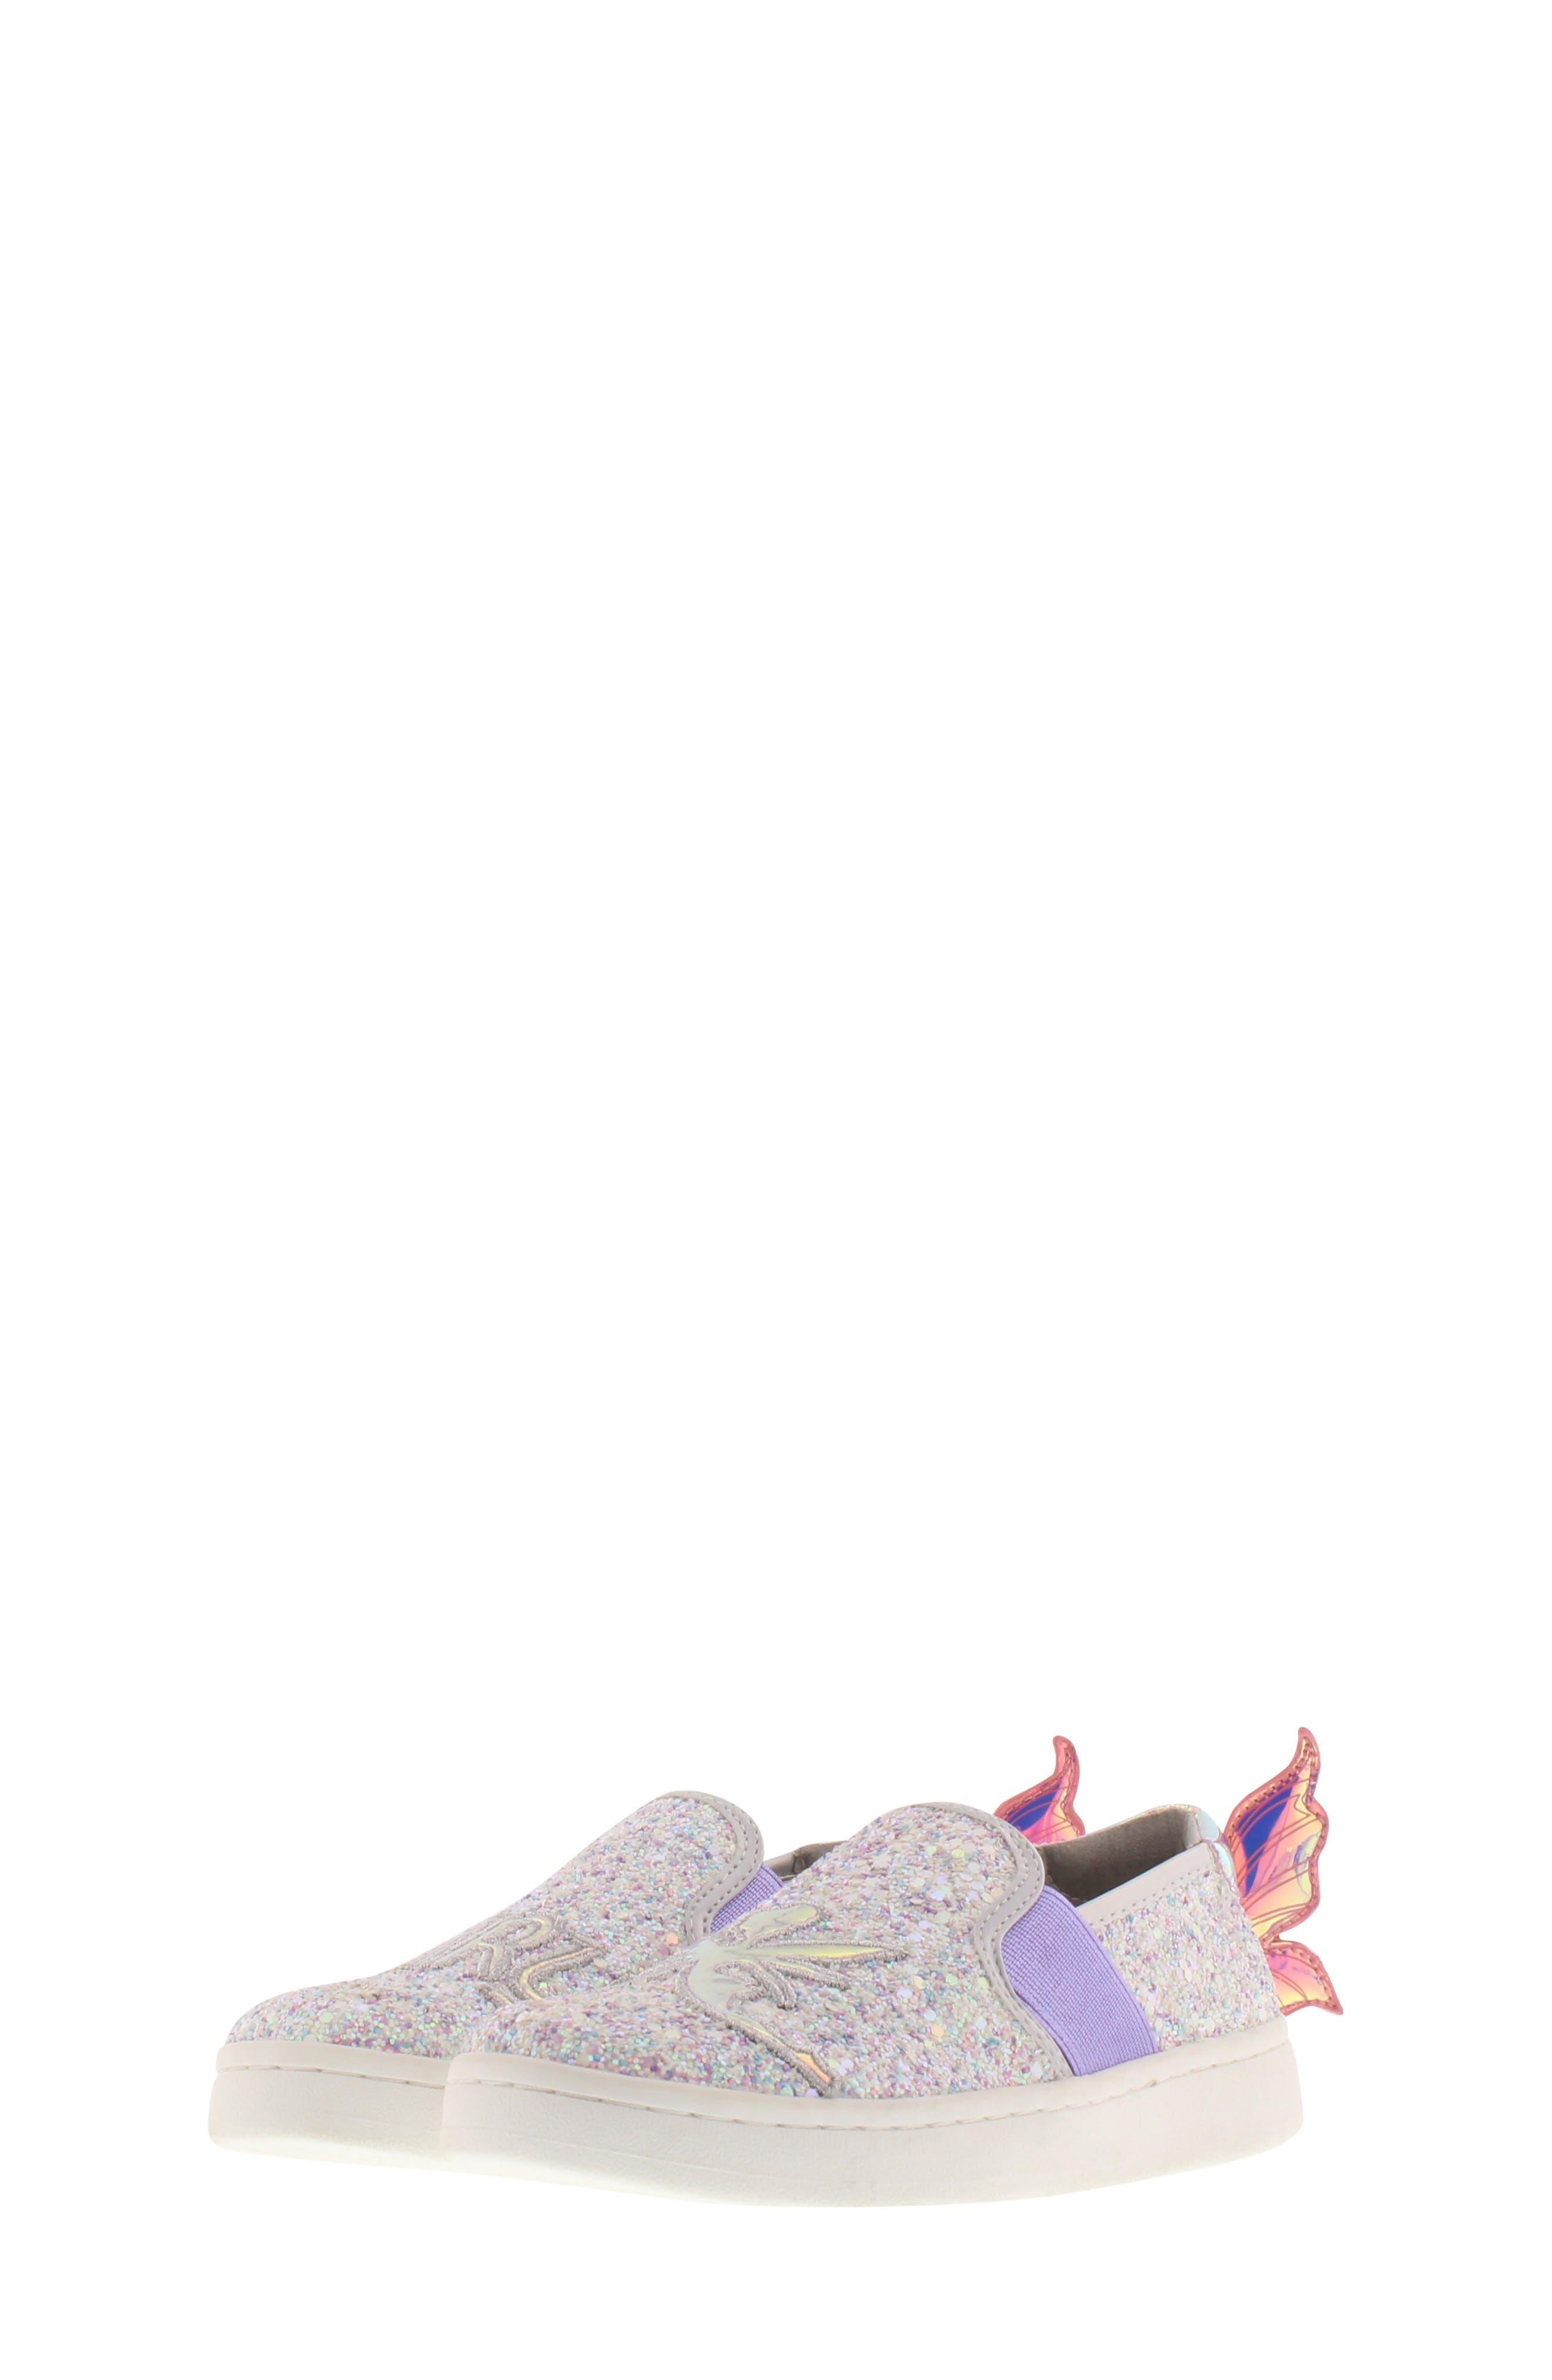 SAM EDELMAN Blake Lina Fairy Glitter Slip-On Sneaker, Main, color, PINK/ PURPLE